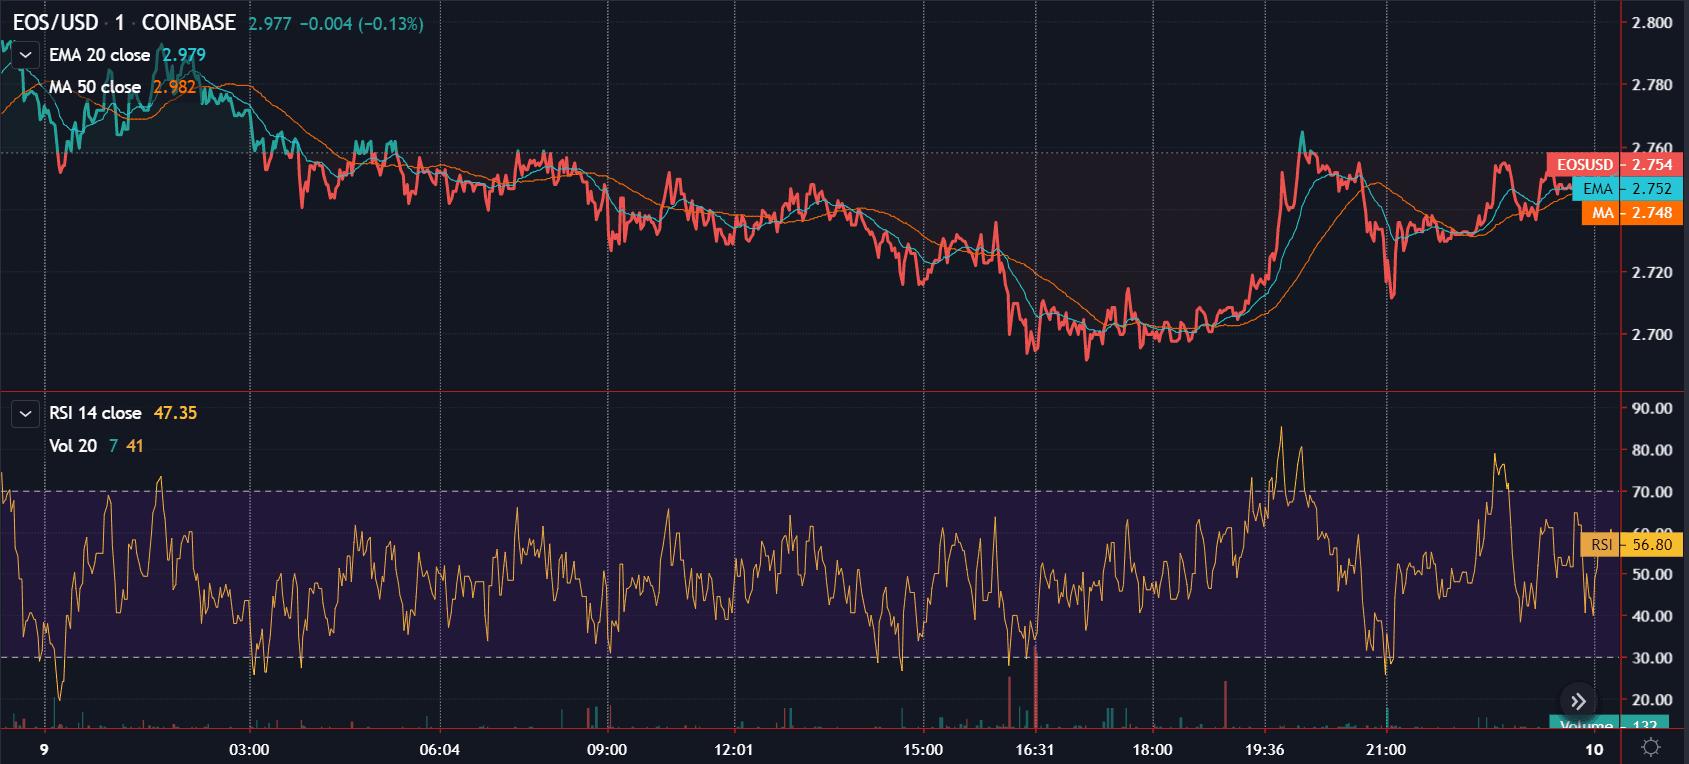 EOS trading